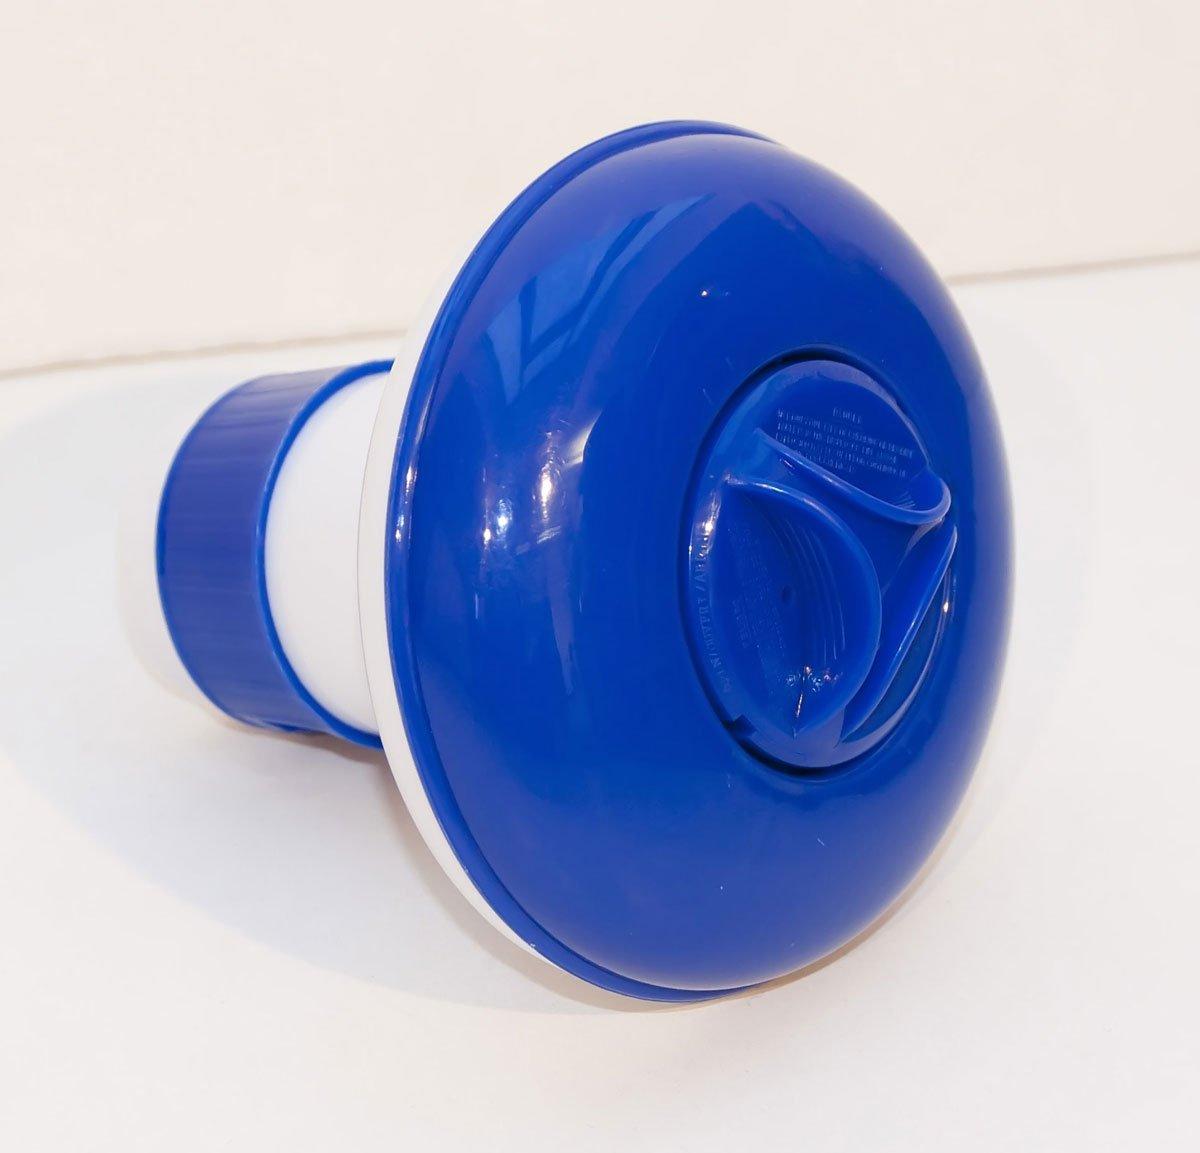 Piscina Dosificador flotante de cloro dosificadora flotador para 20 g pastillas de cloro: Amazon.es: Jardín